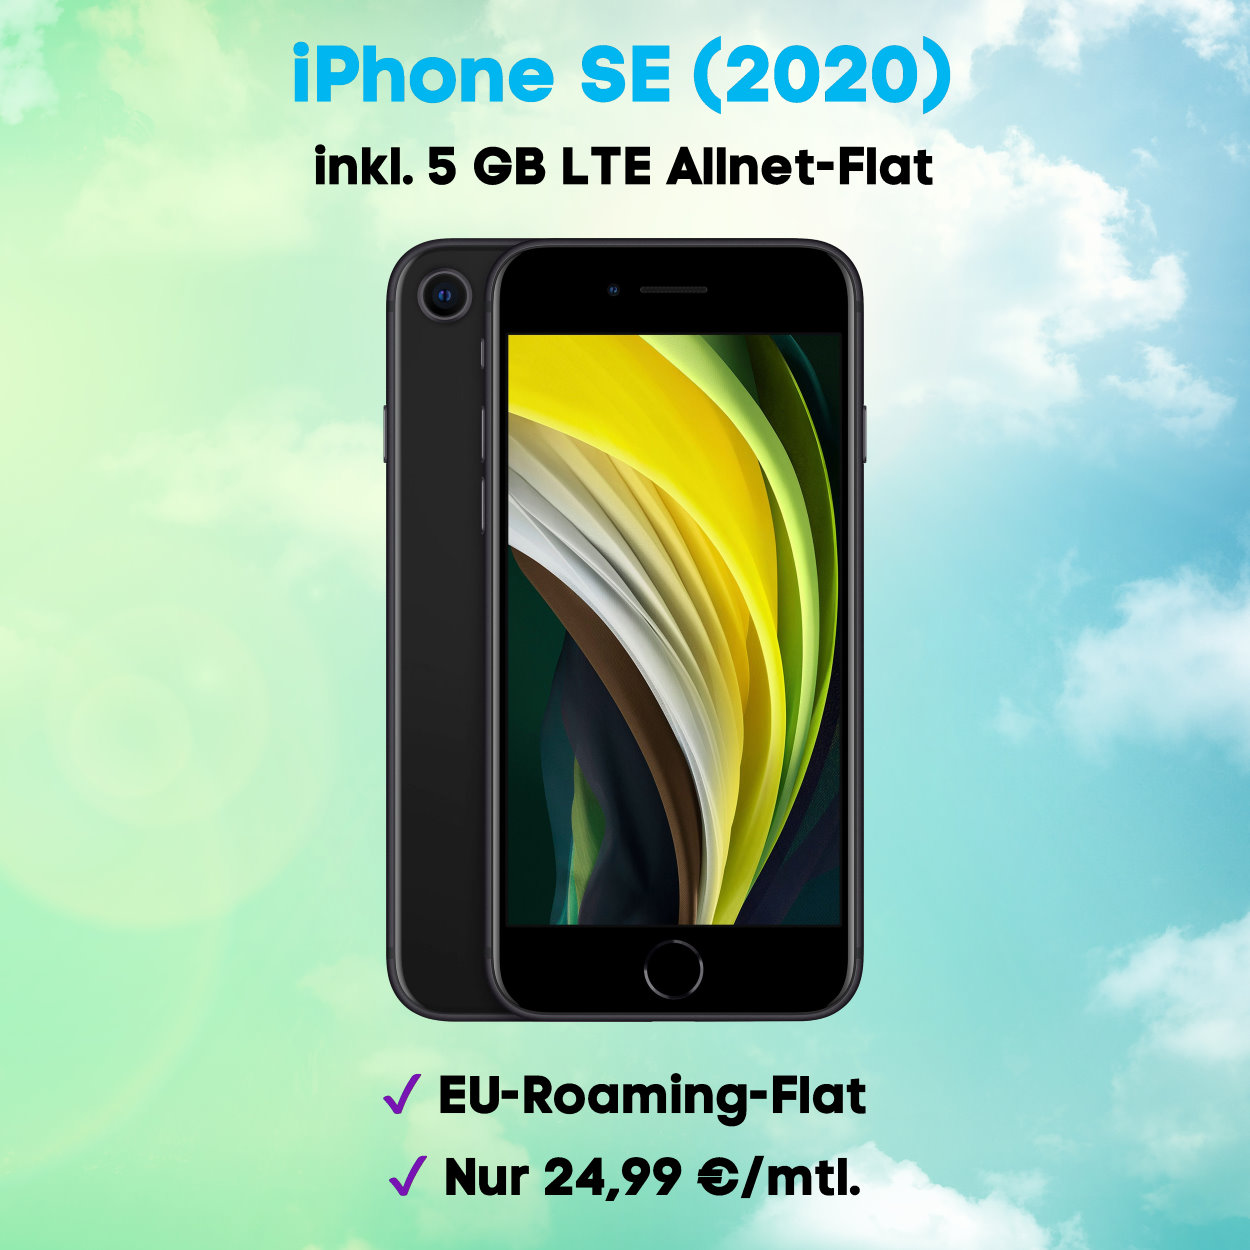 iPhone SE 2020 Handyvertrag inkl. 5 GB LTE Allnet-Flat